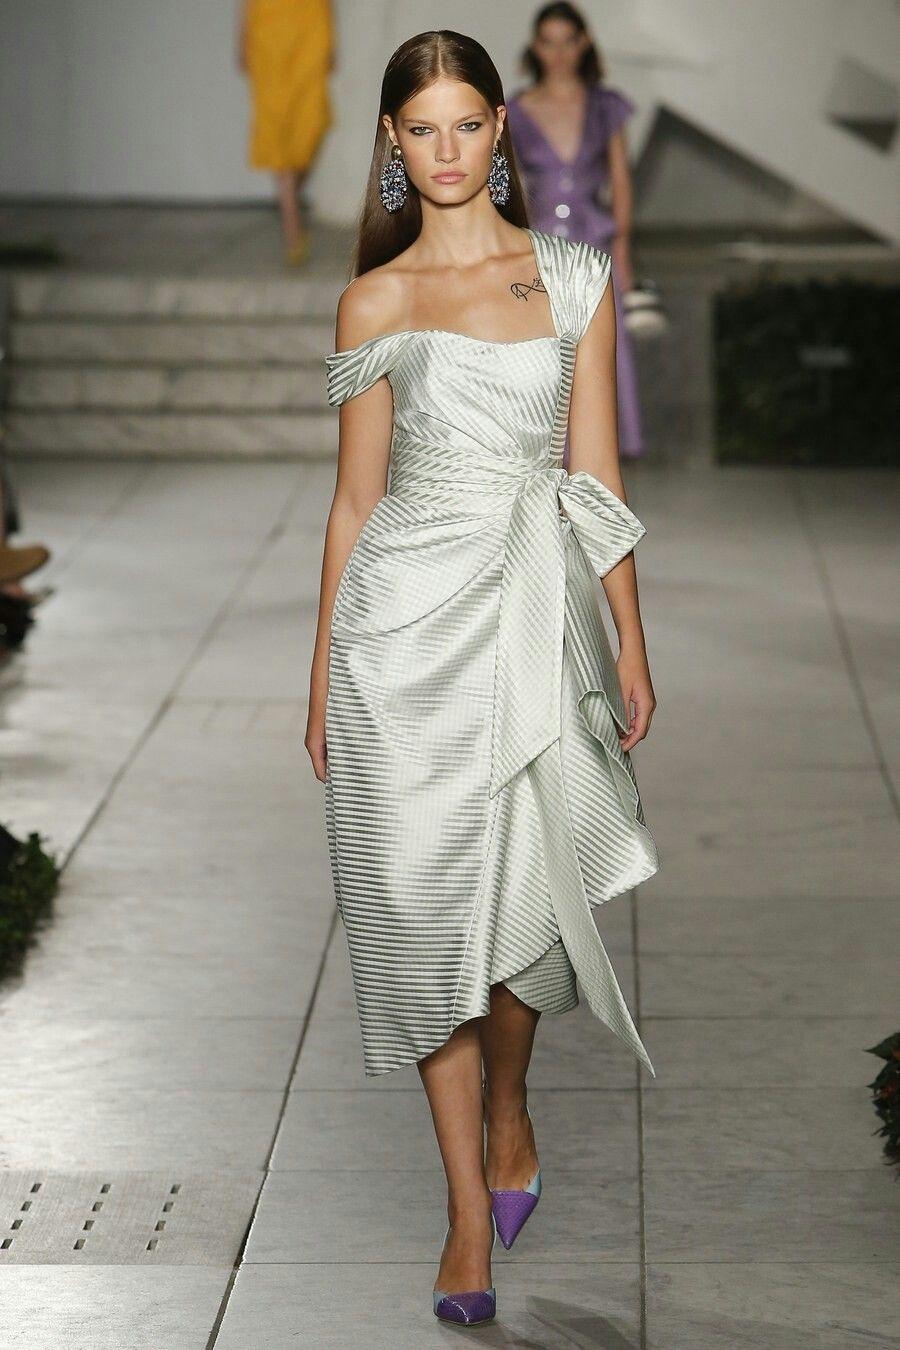 http://www.morpheusboutique.com | Girls fashion tween